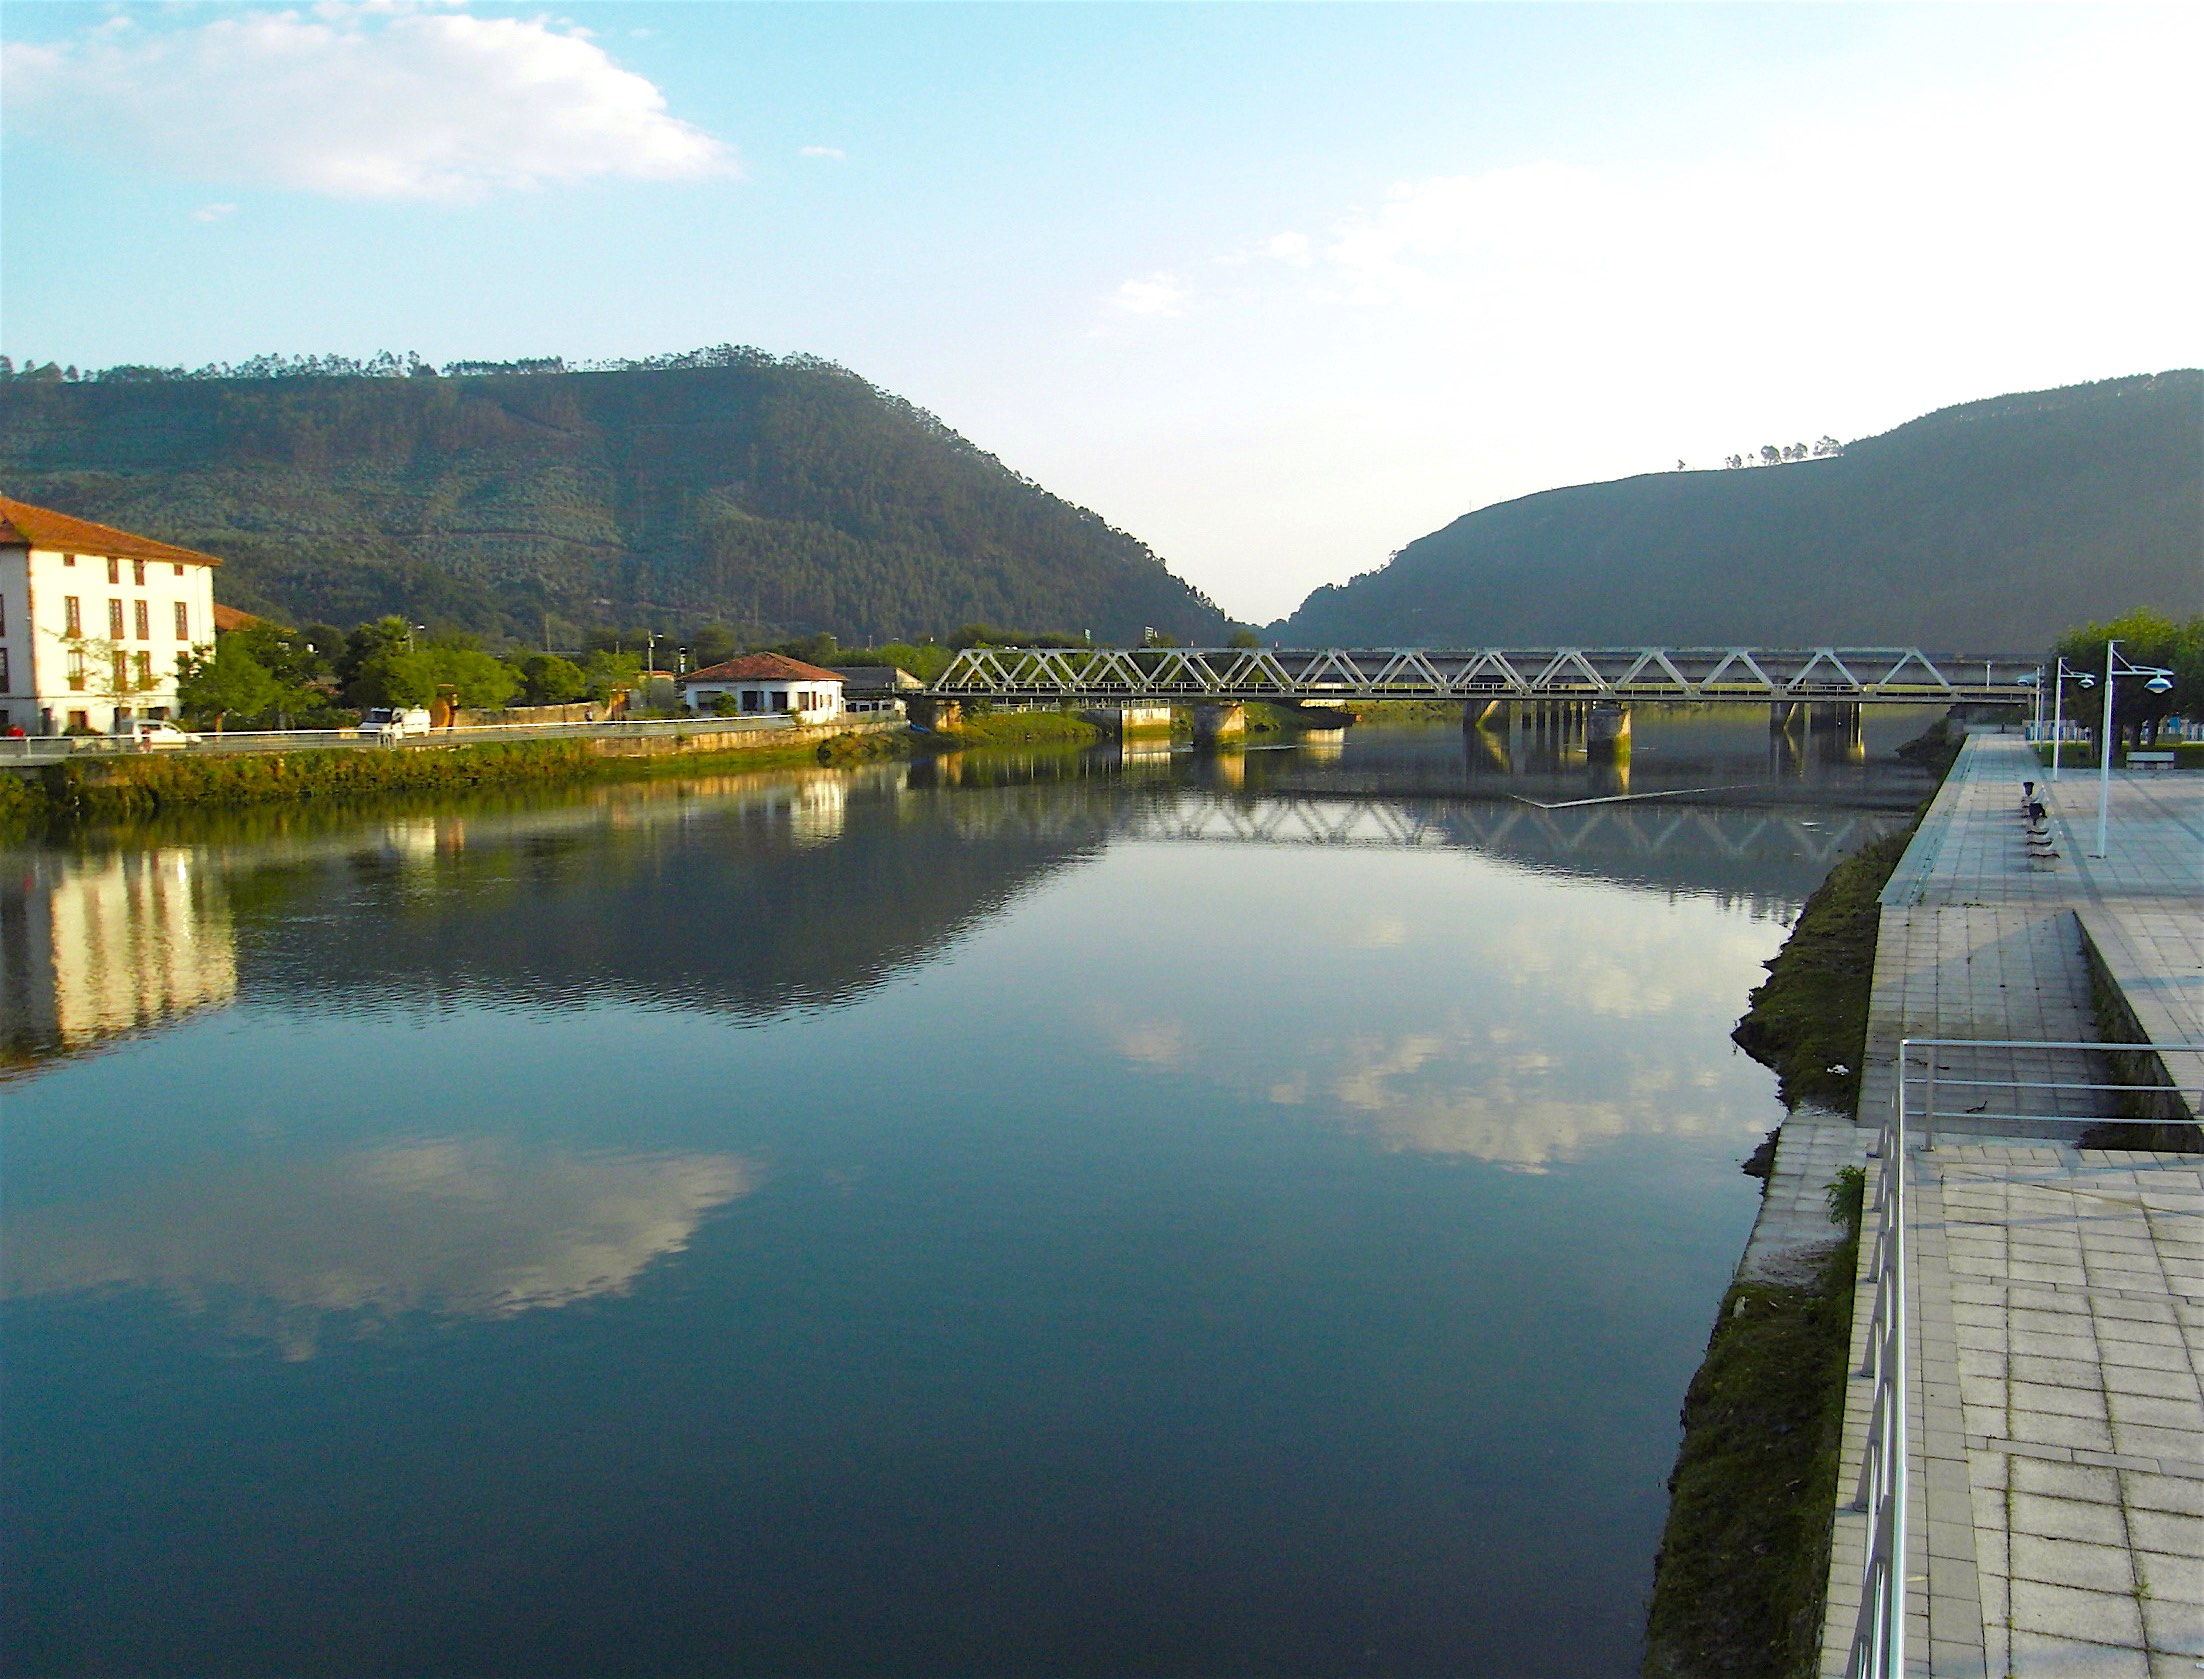 Le río Deva (fleuve orphelin), sur le camino del Norte, sépare Cantabria et Asturias © plblaix